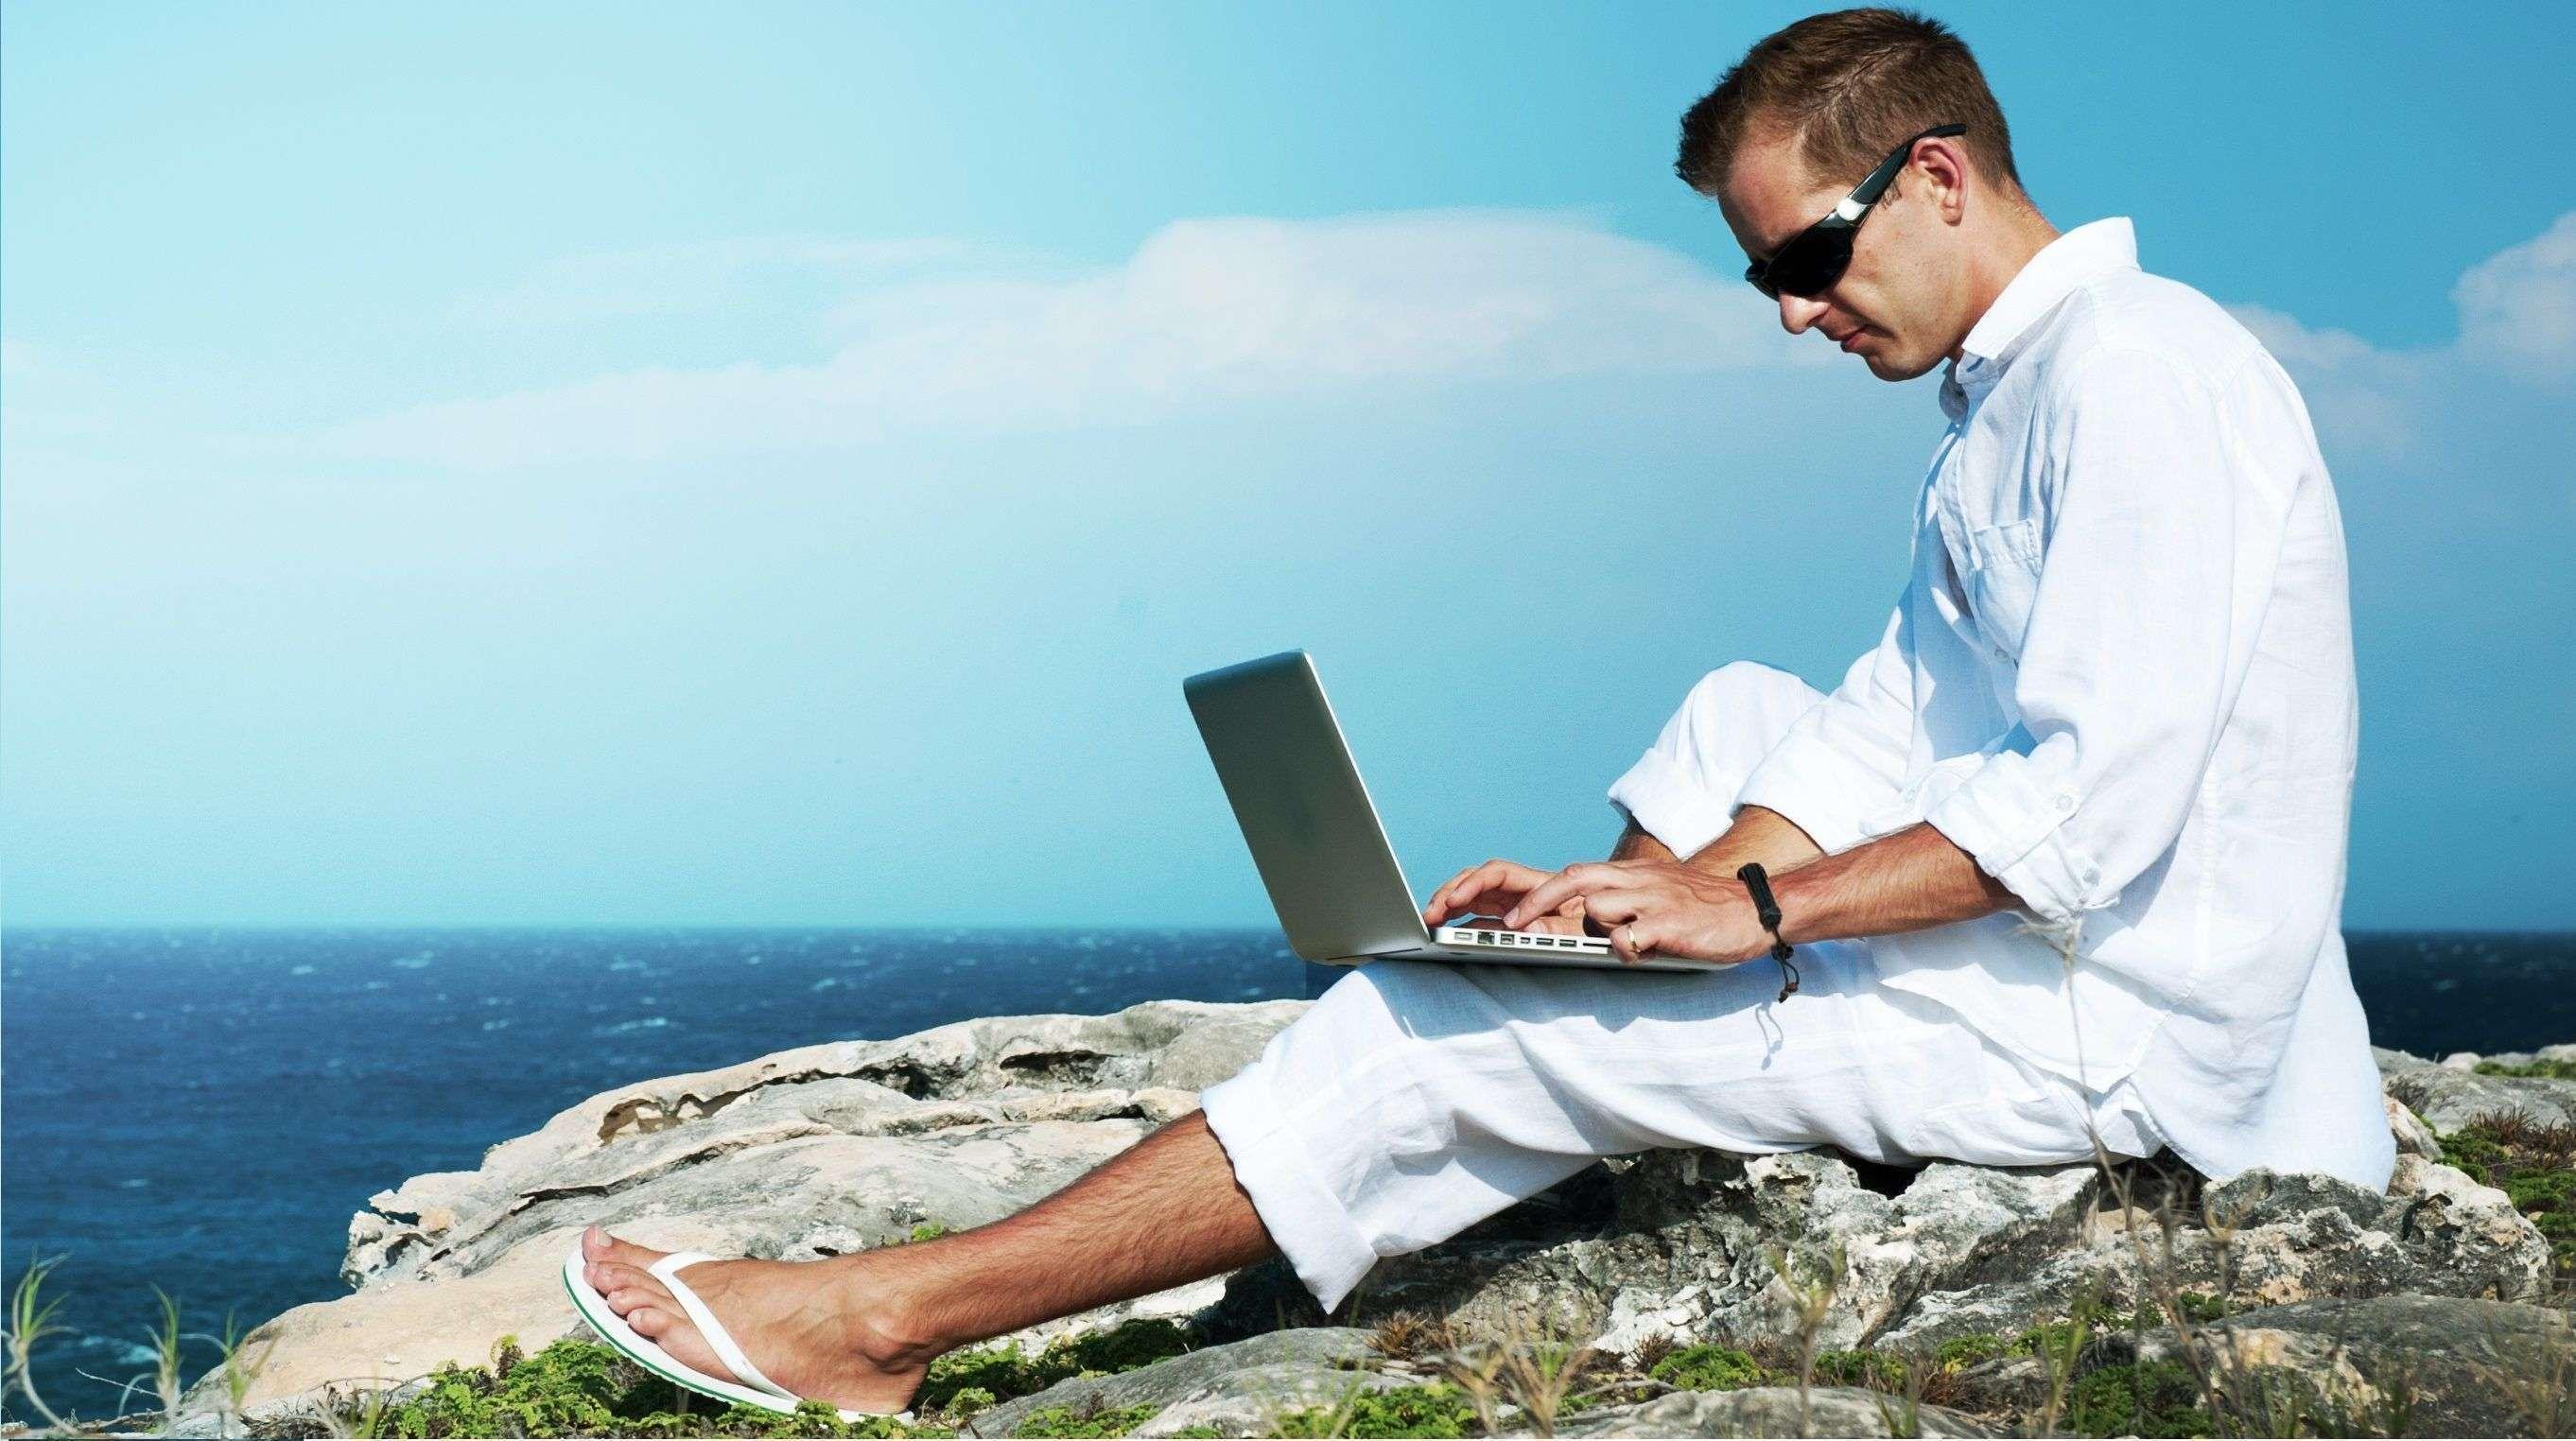 lanzarse a trabajar freelance